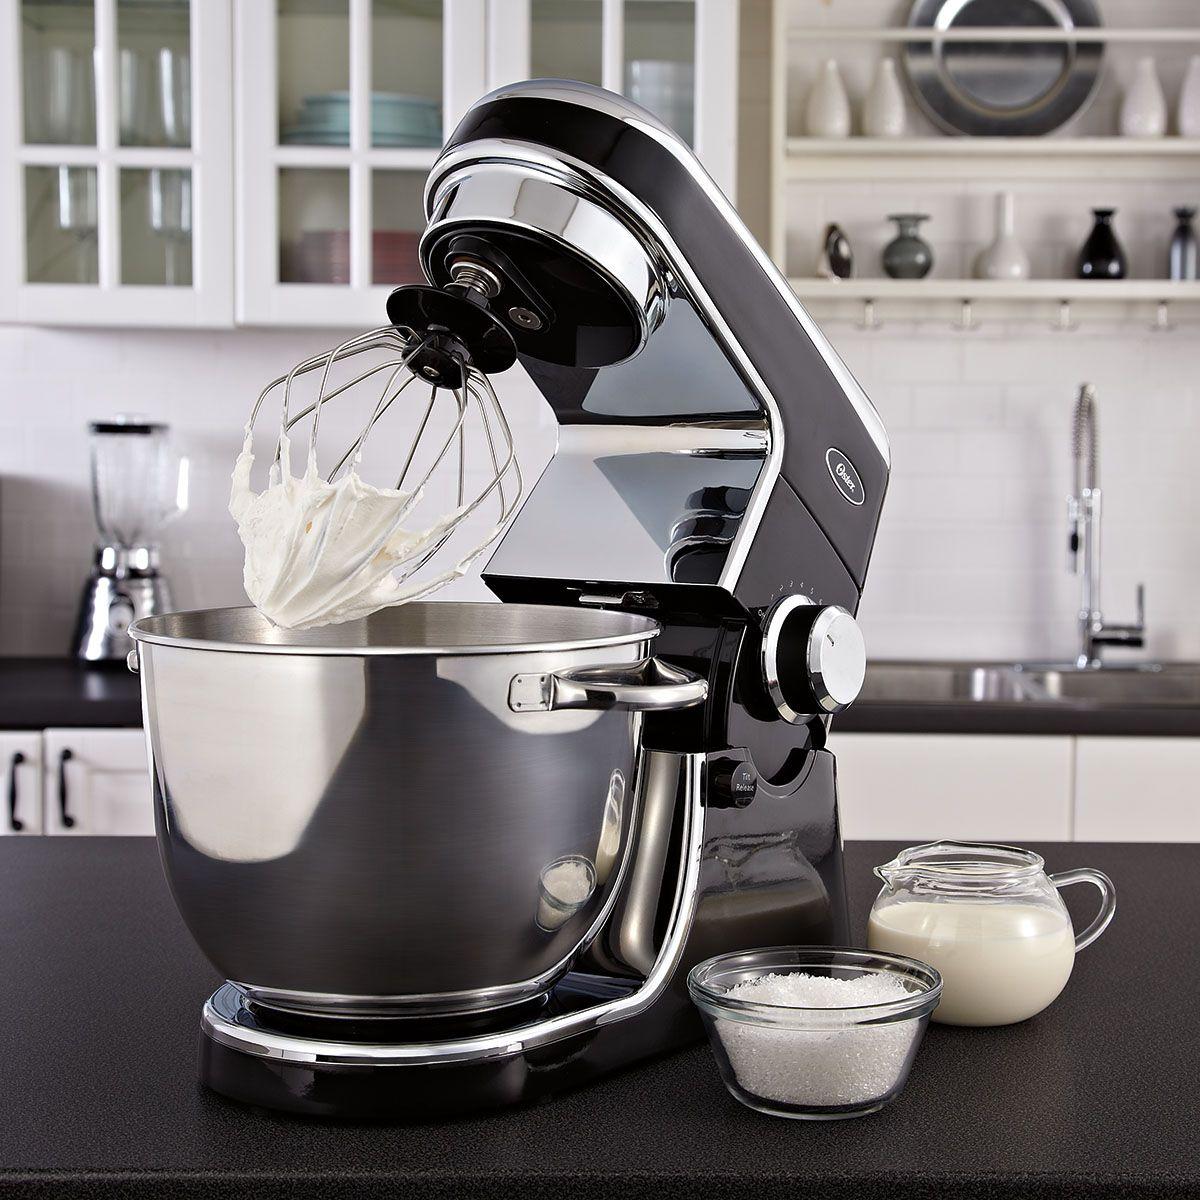 kitchenaid mixer parts catalog